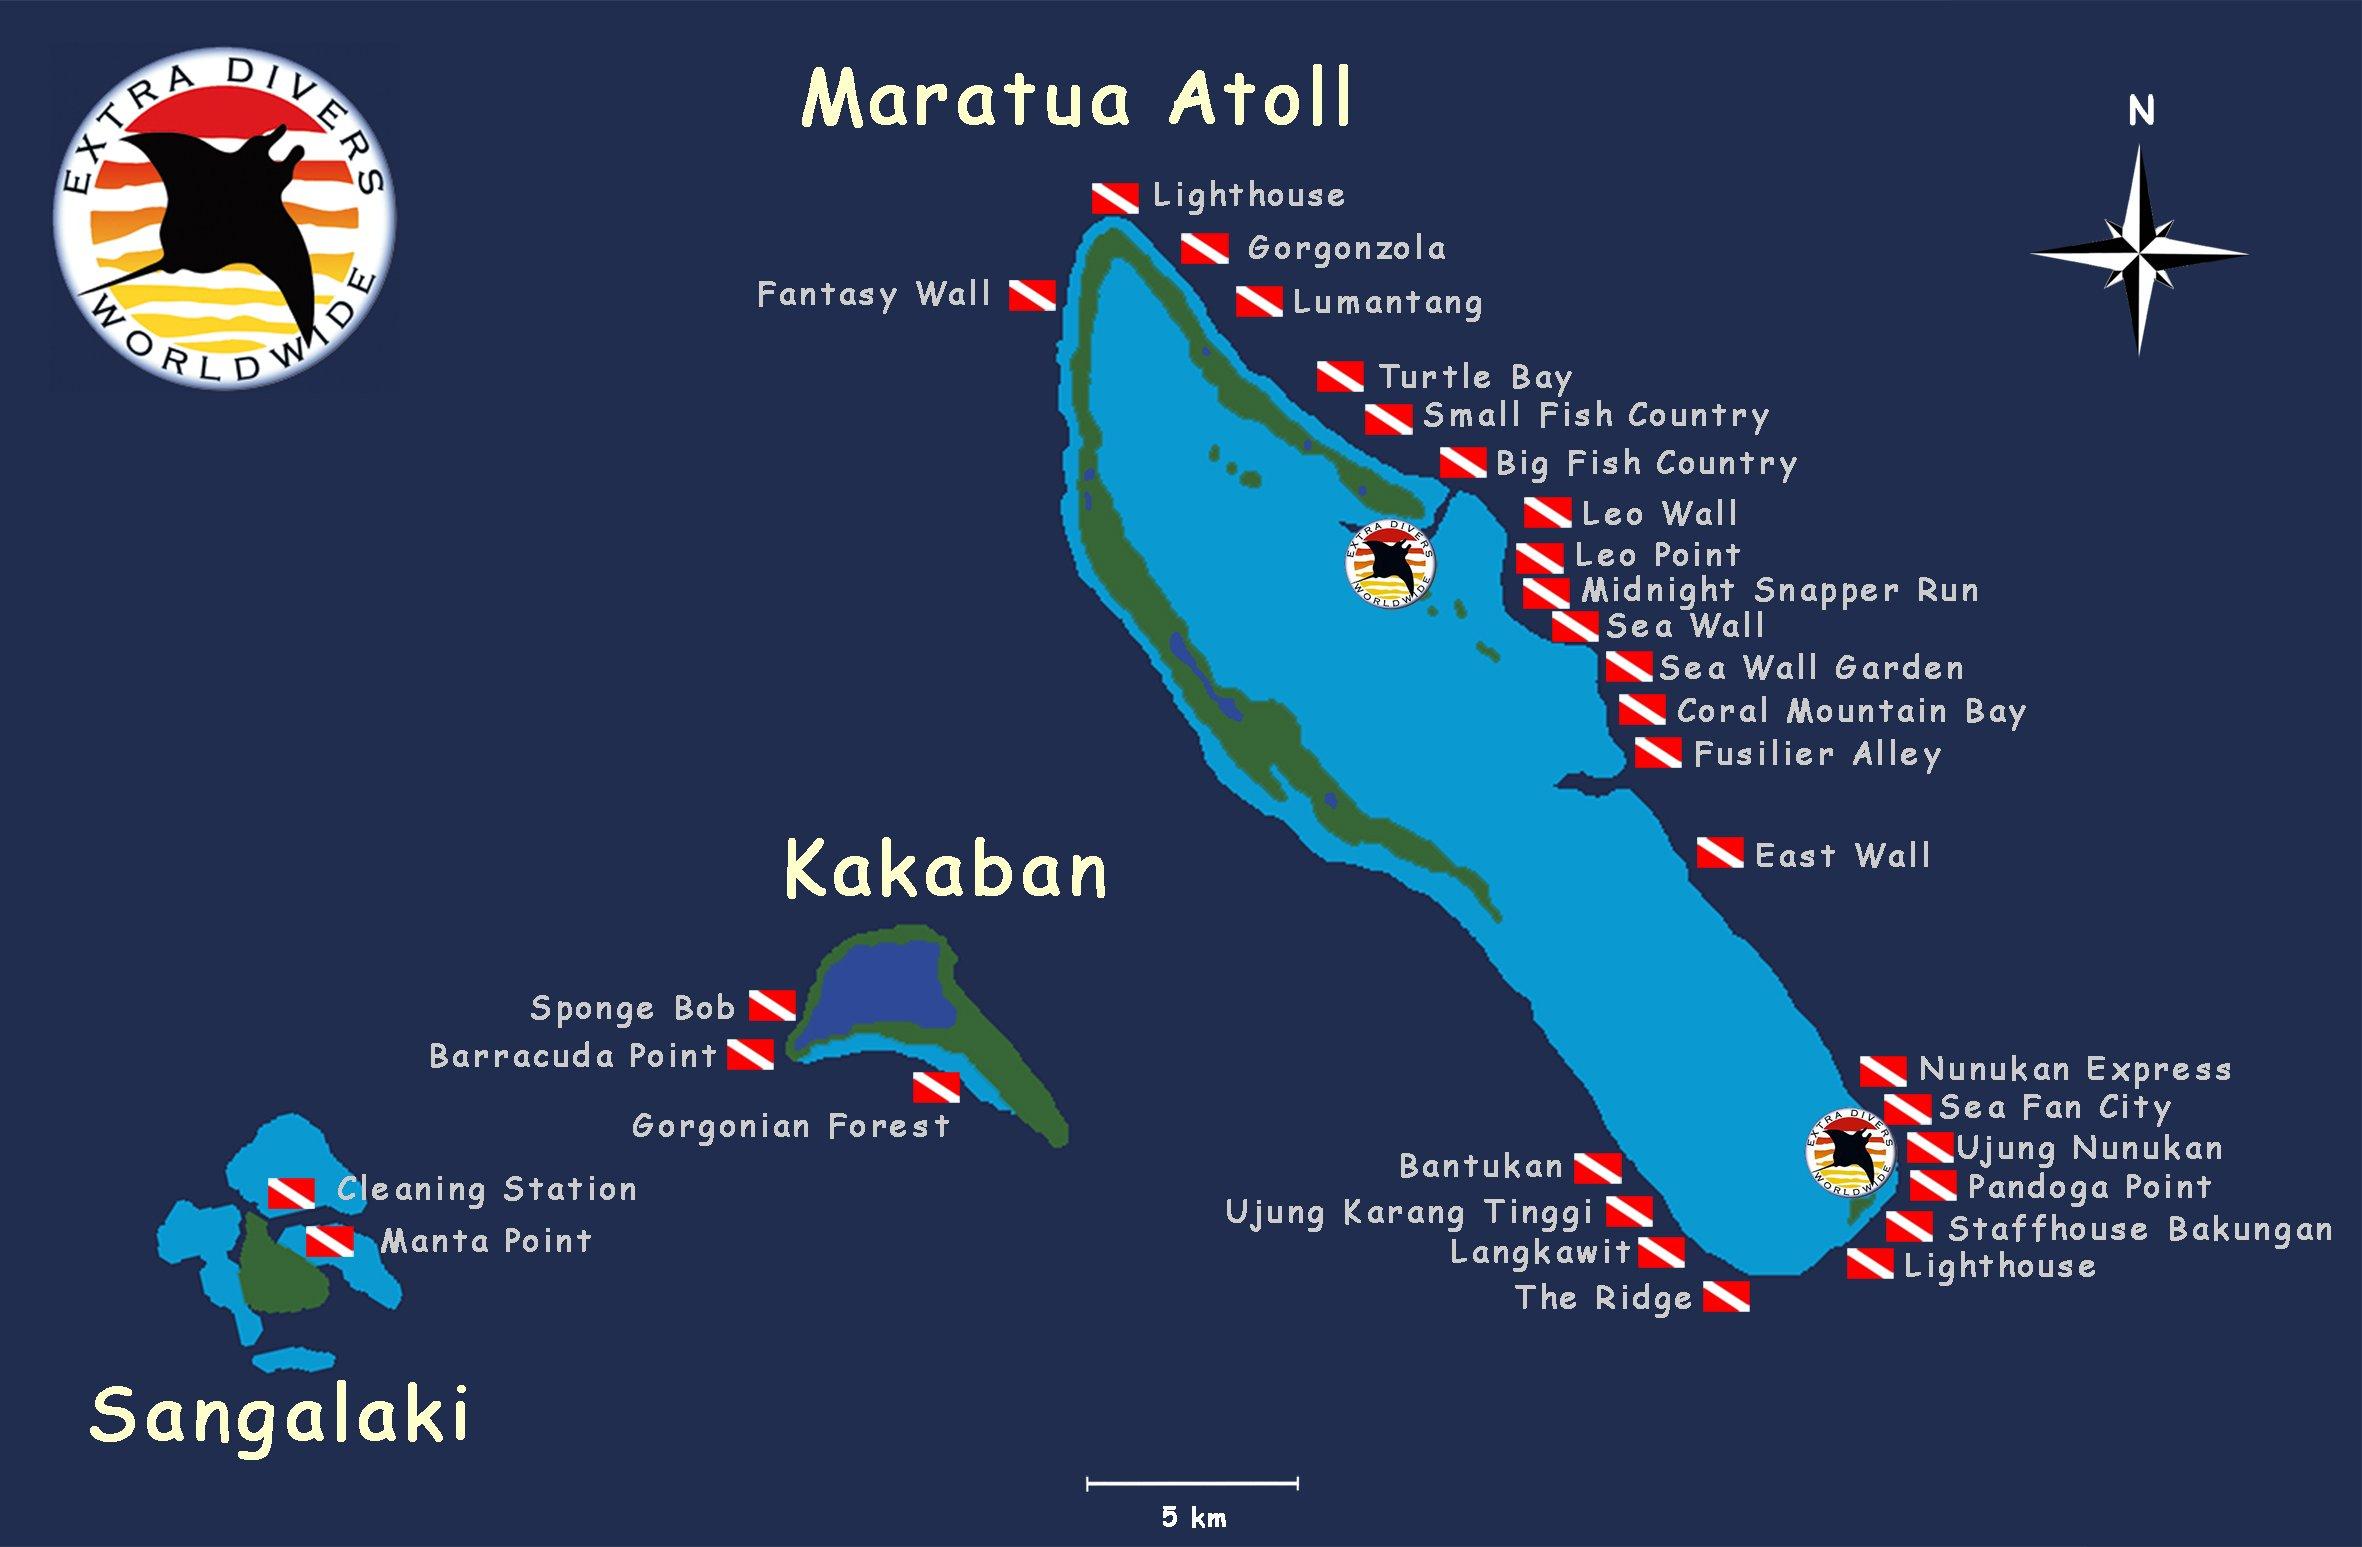 Maratua dive map